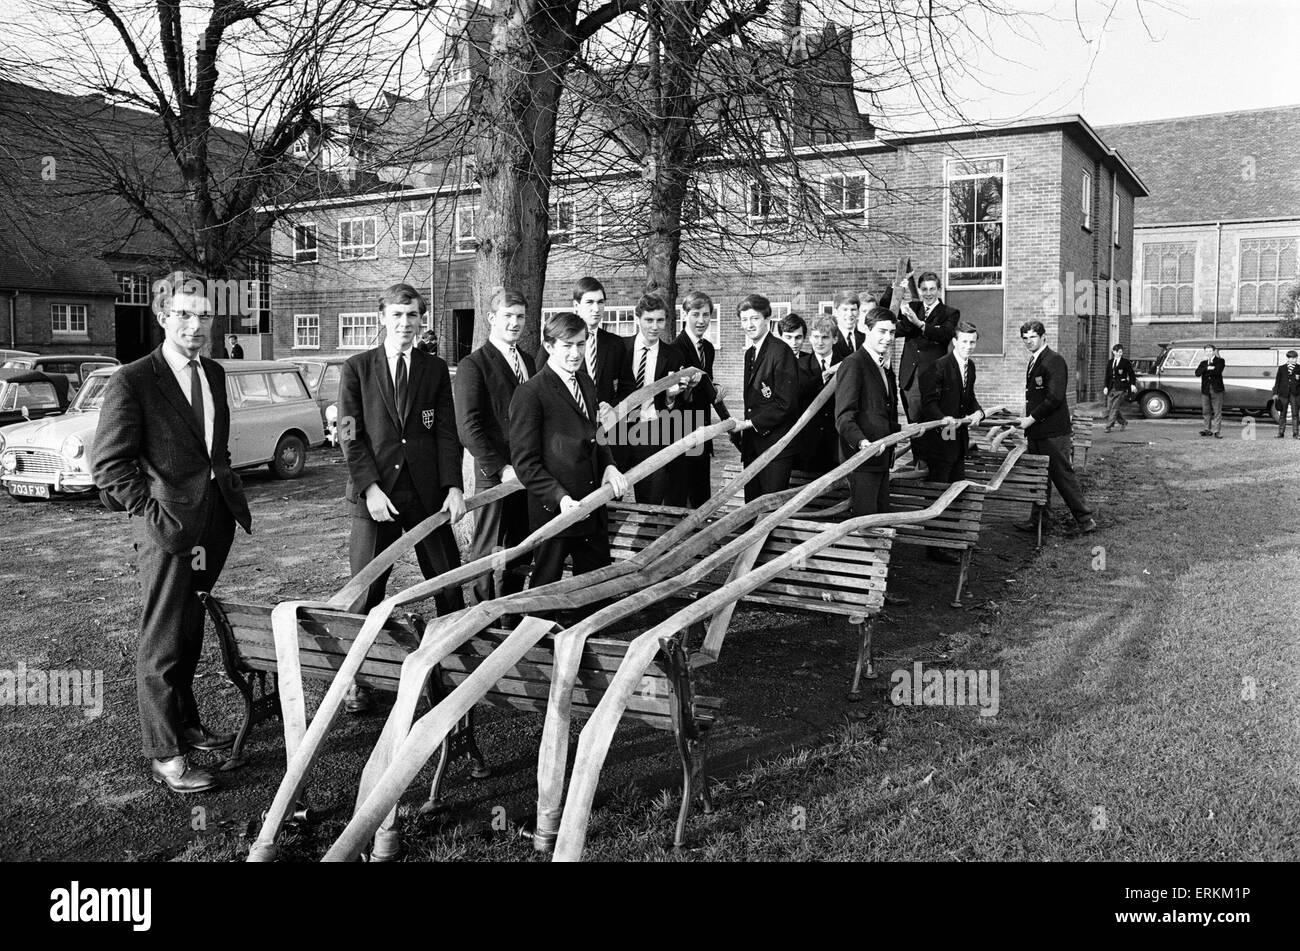 Warwick School fire brigade, 13th December 1966. - Stock Image